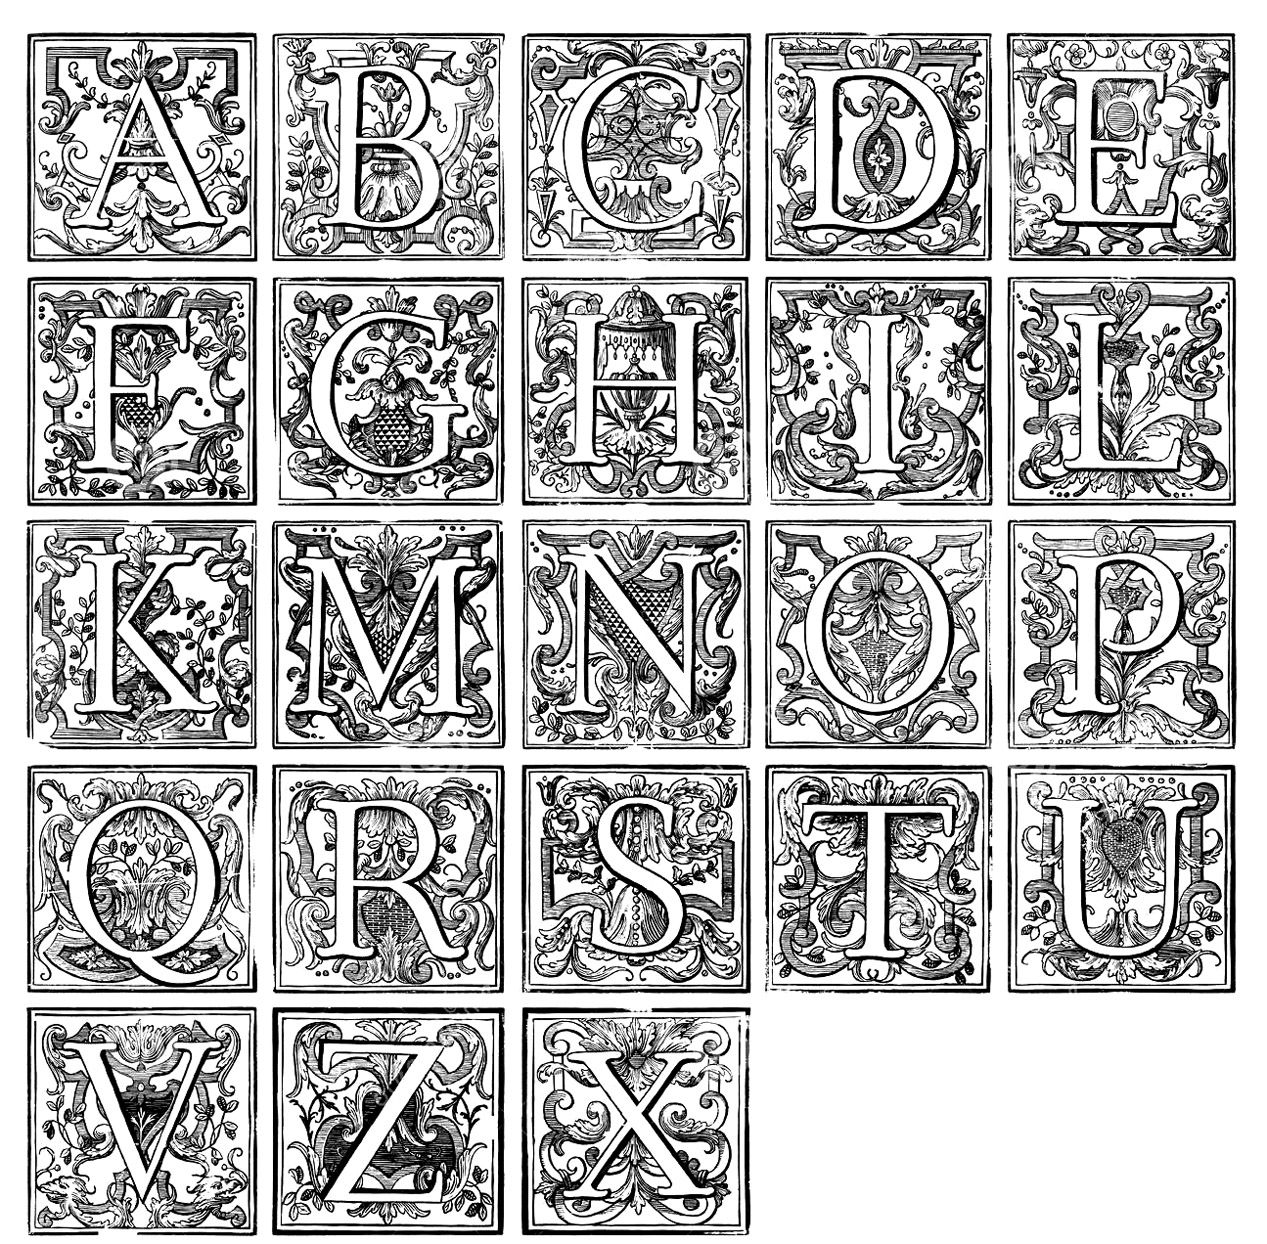 Alphabet Vintage Vintage Alphabet From The Gallery Vintage Keywords Alphabet Just Color Di Alphabet Coloring Pages Lettering Alphabet Coloring Pages